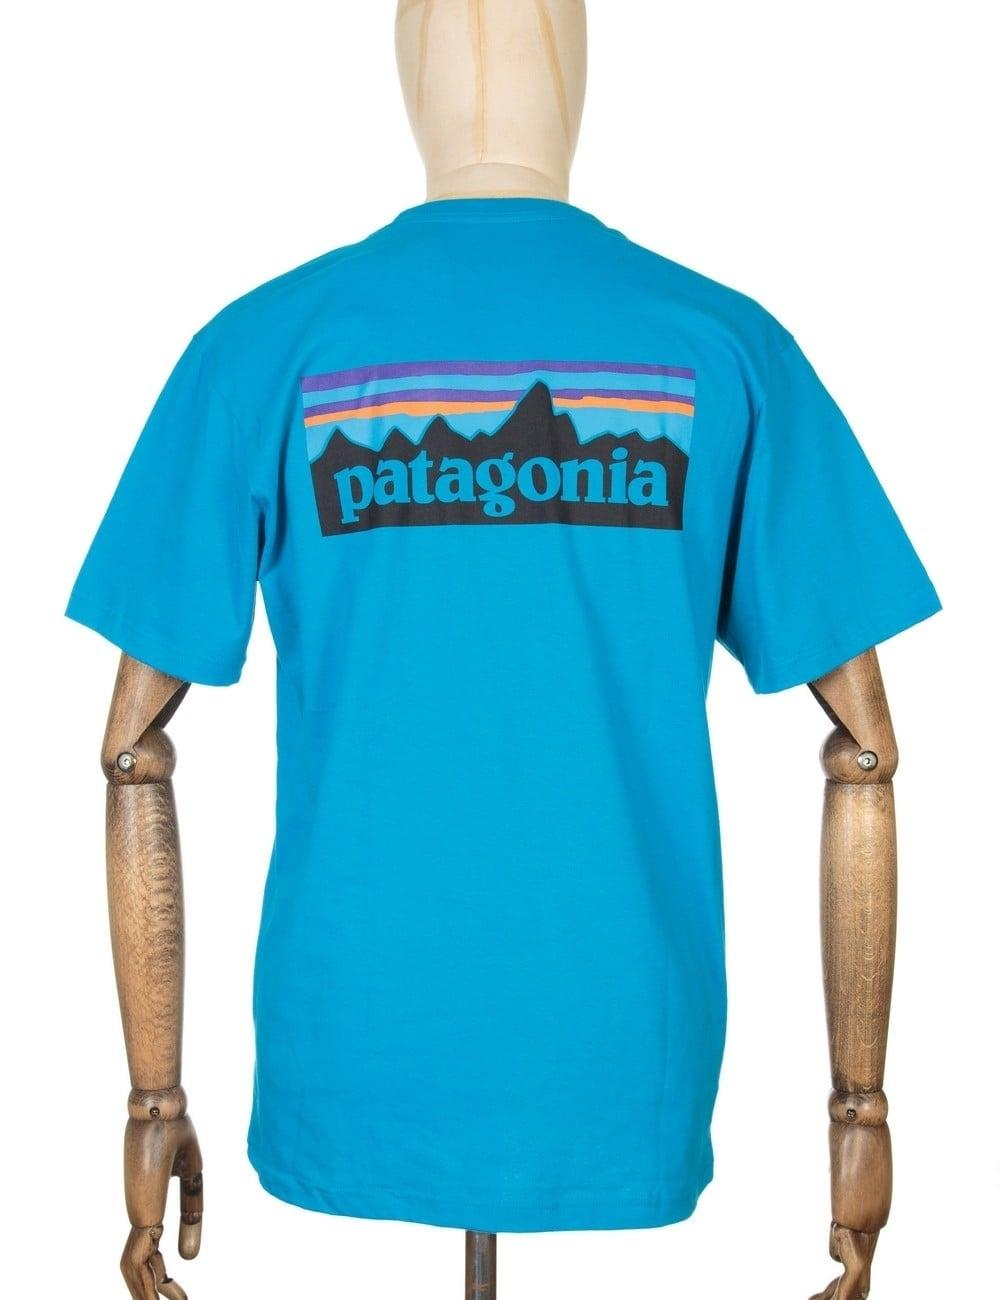 Patagonia P-6 Logo T-shirt - Grecian Blue - Clothing from Fat Buddha ...